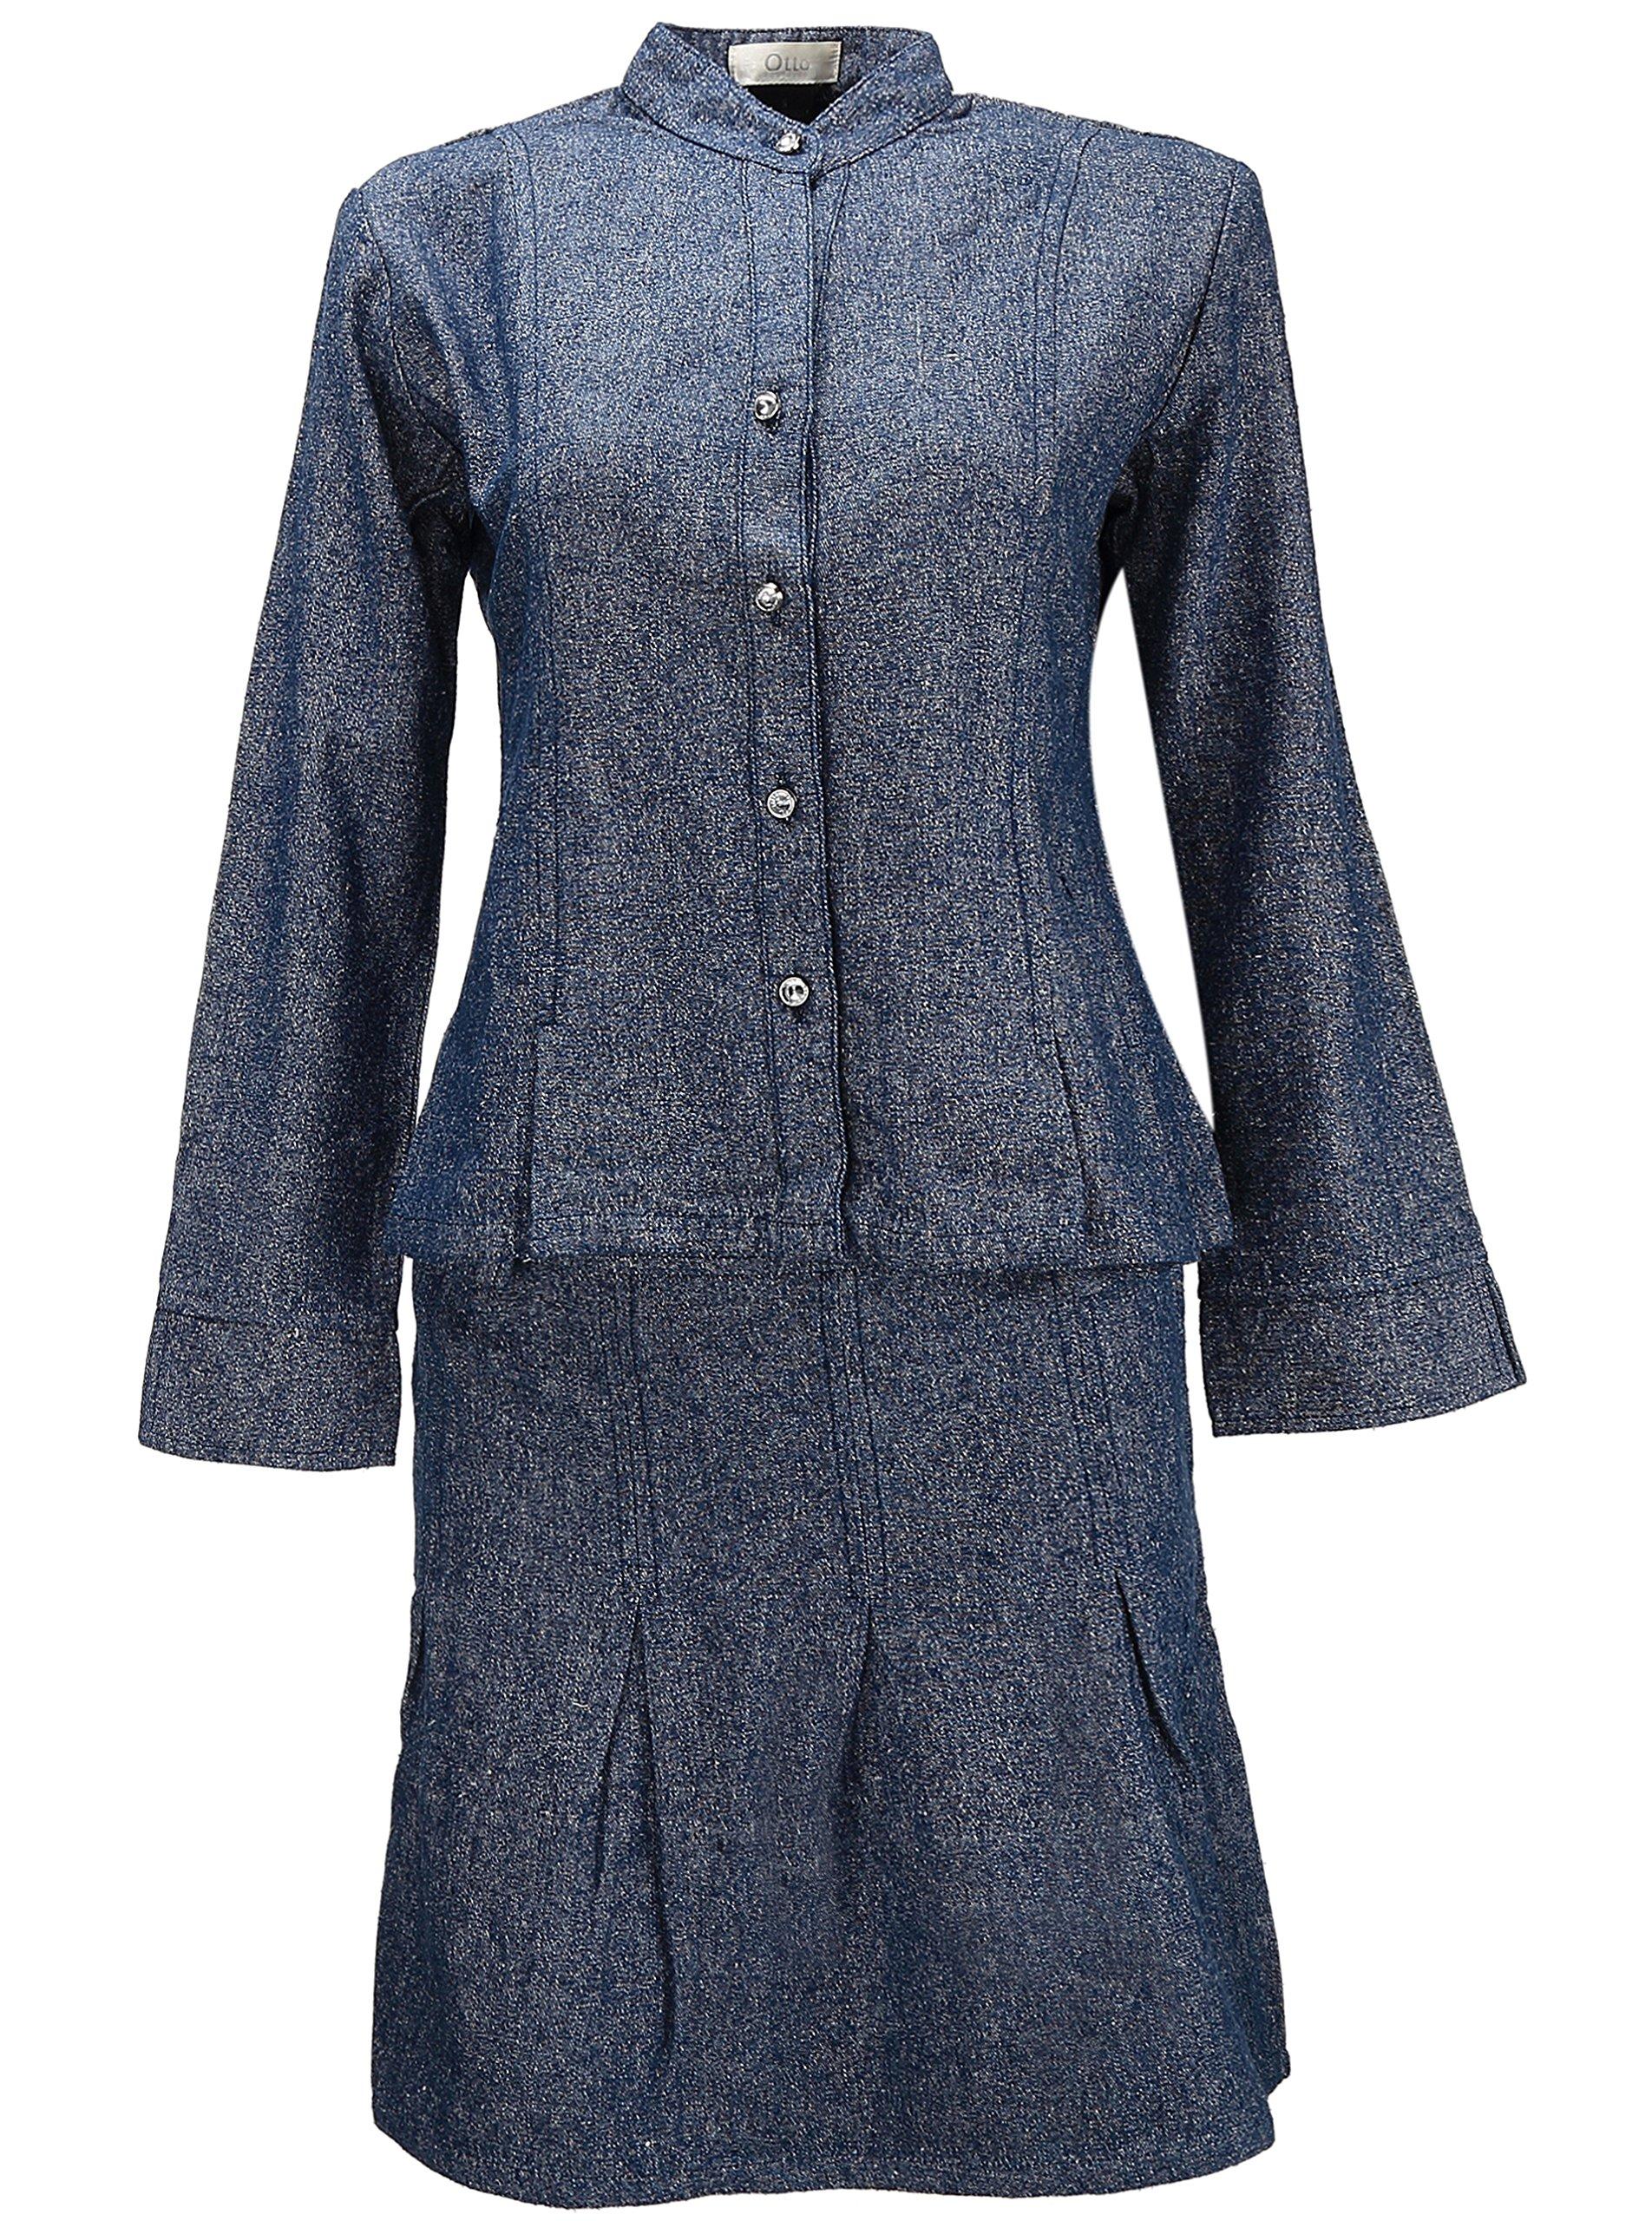 GEEK LIGHTING Women's Classic Denim Straight Curvy Fit Skirt Suit Dark Heather Large